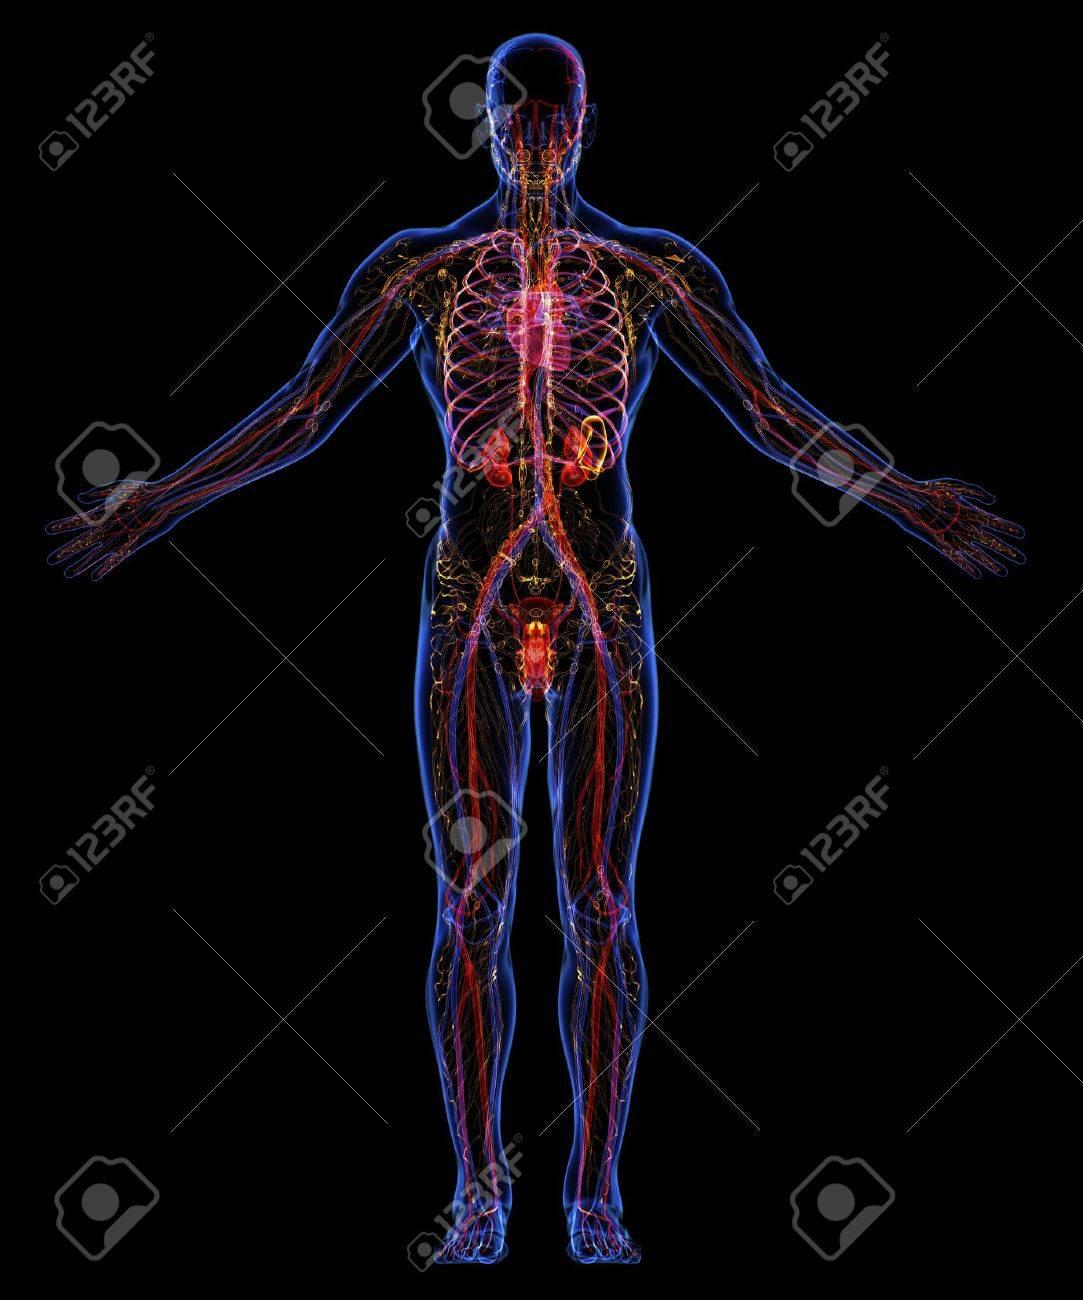 Human urinary, lymphatic and circulatory system - 18292511